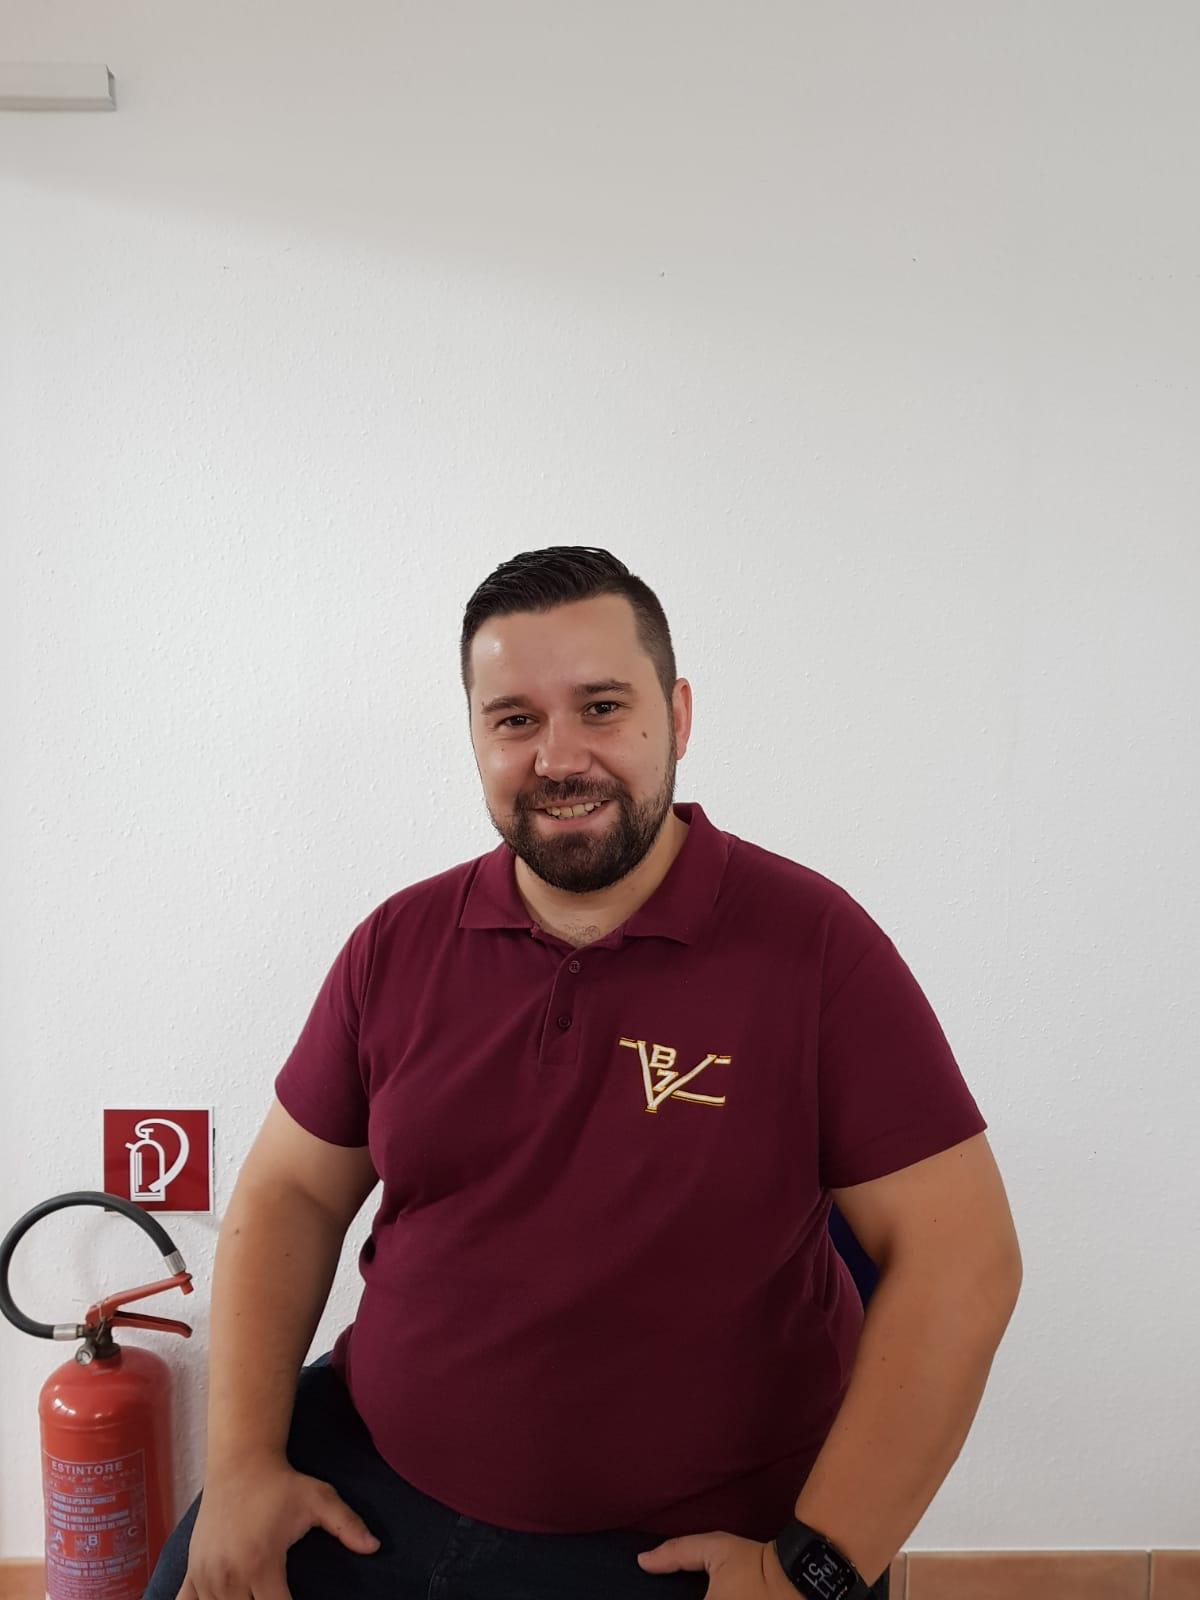 Team VBZ - Josip Basa